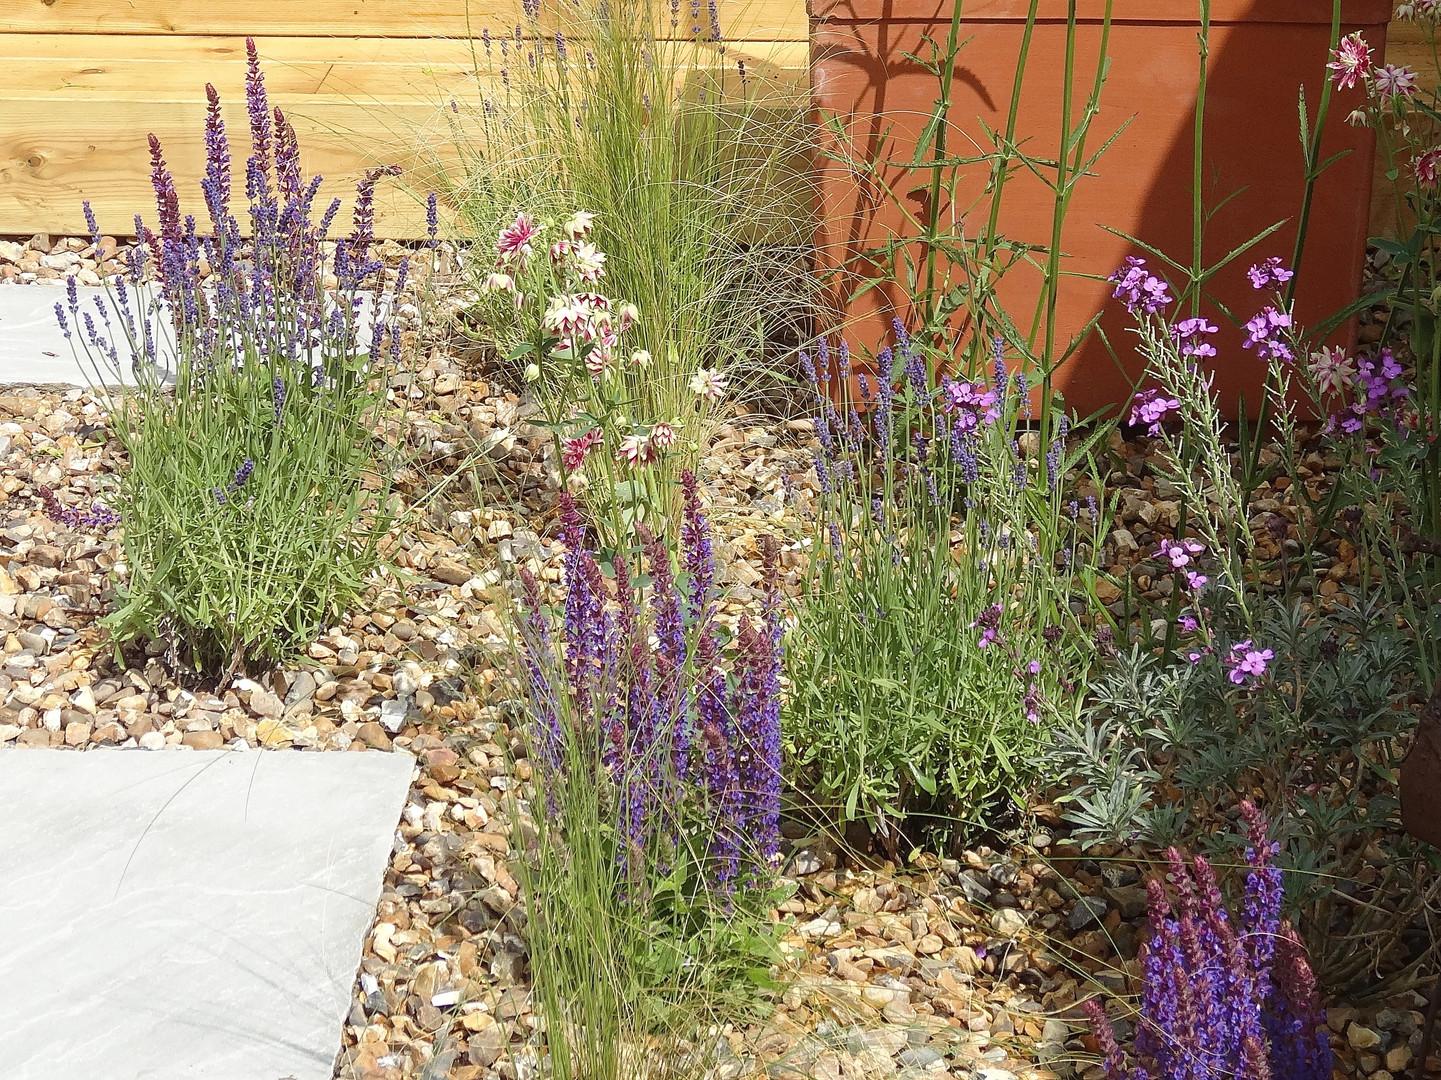 Salvia, lavender and stipa